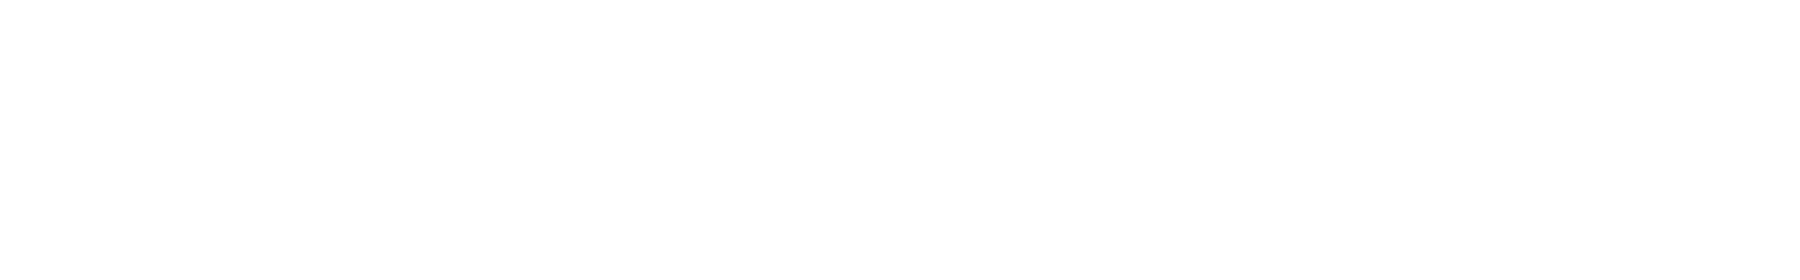 vedh melodyloop 002 gm f dm e 124bpm